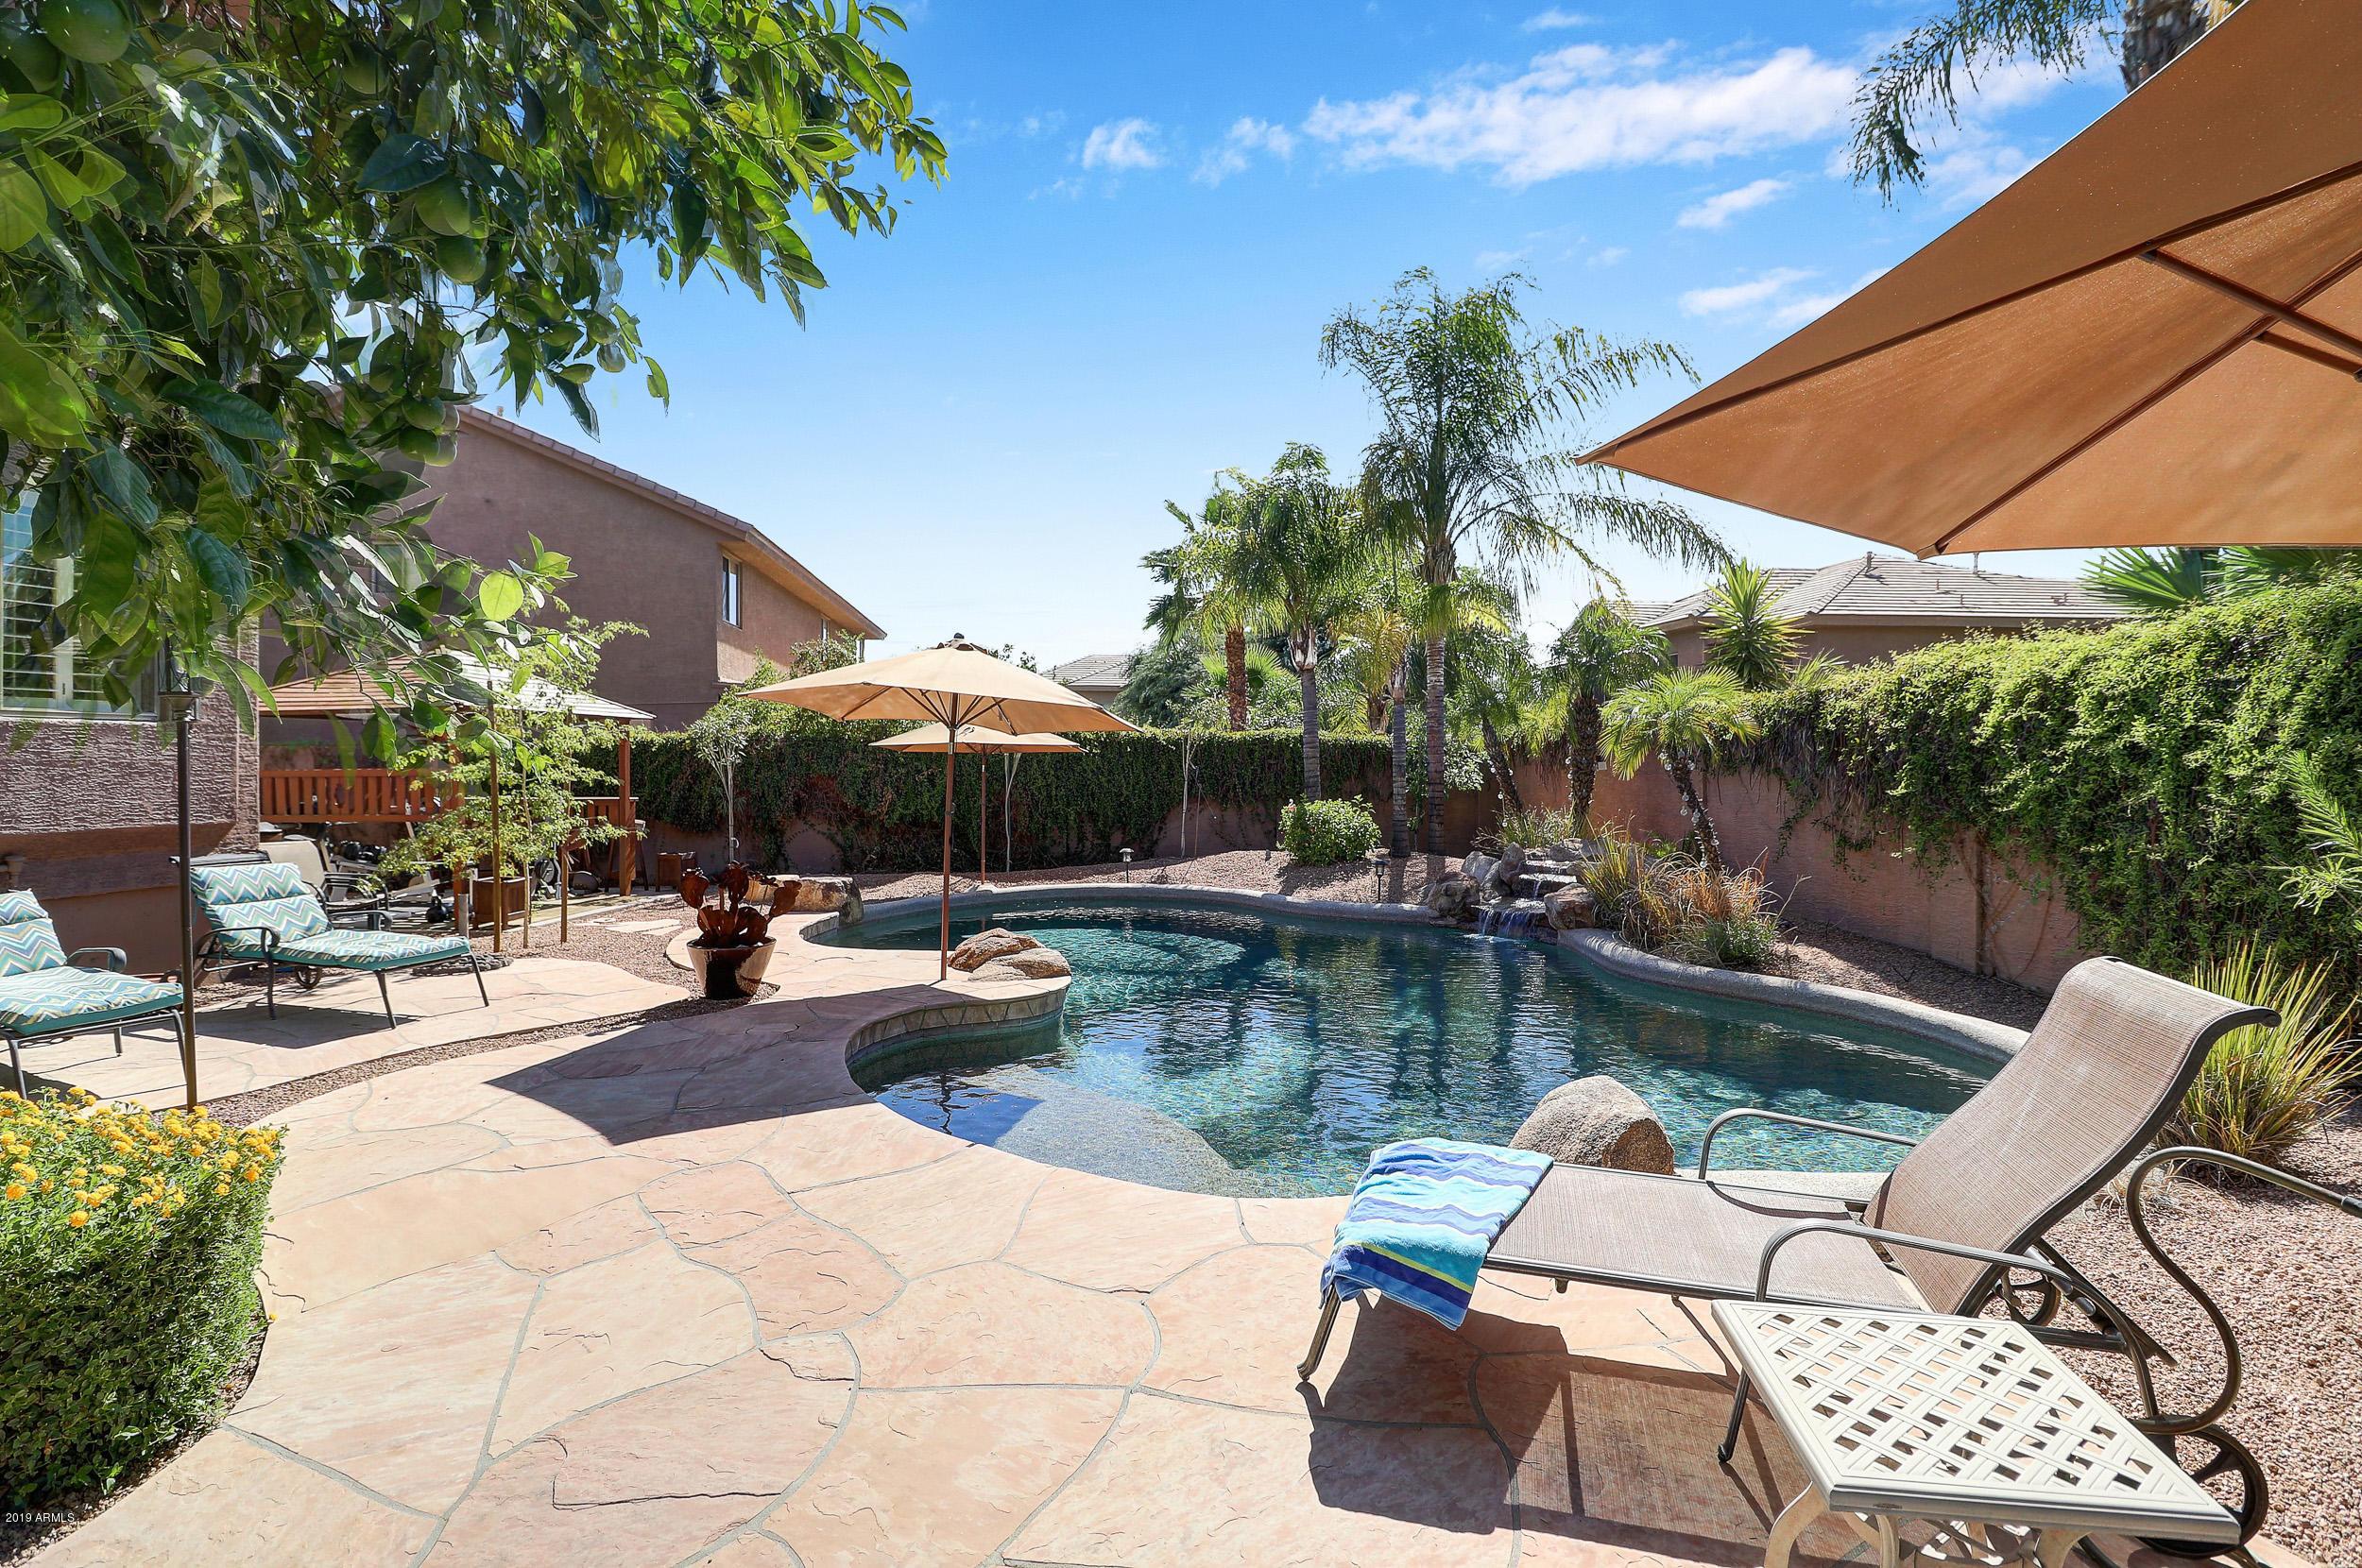 MLS 5969121 33210 N 61ST Street, Scottsdale, AZ 85266 Scottsdale AZ Private Pool